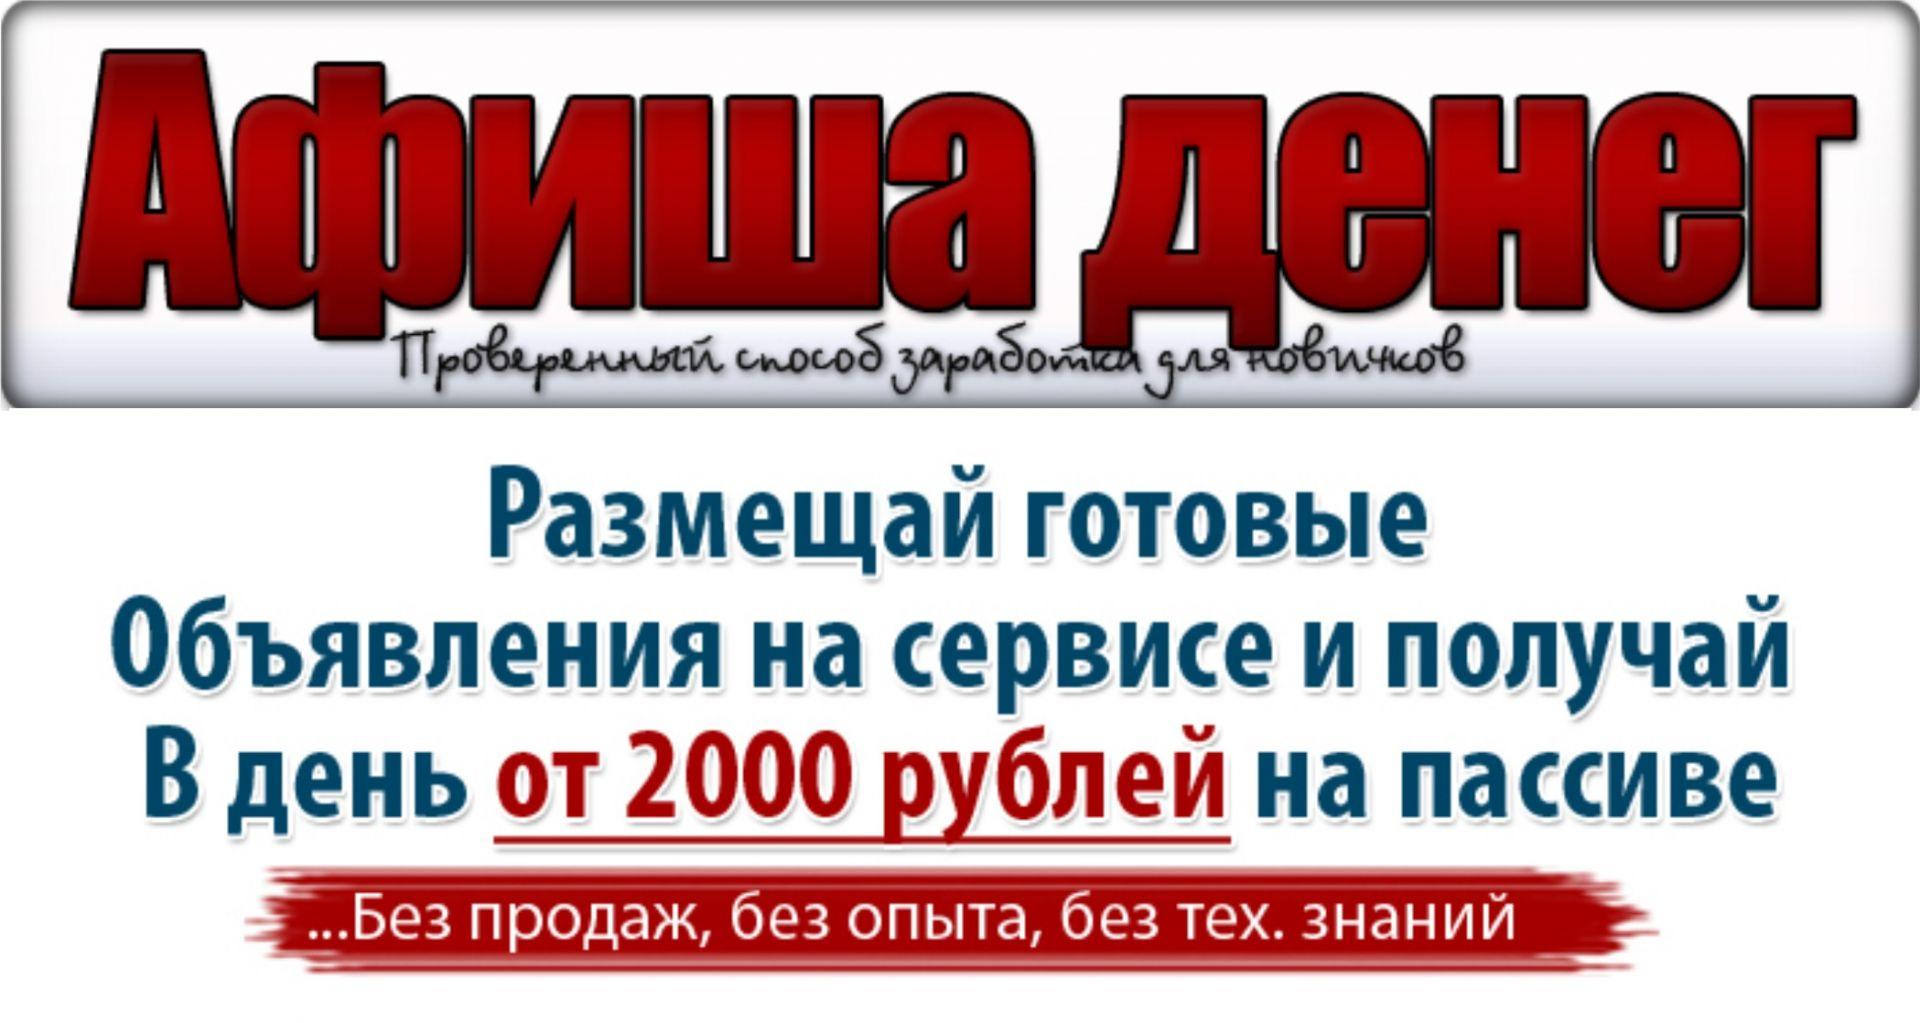 http://u1.platformalp.ru/91e2ca1e741df099d1914784d25a4715/2272d8ebe047b8cf270ec991dab846ec.jpg